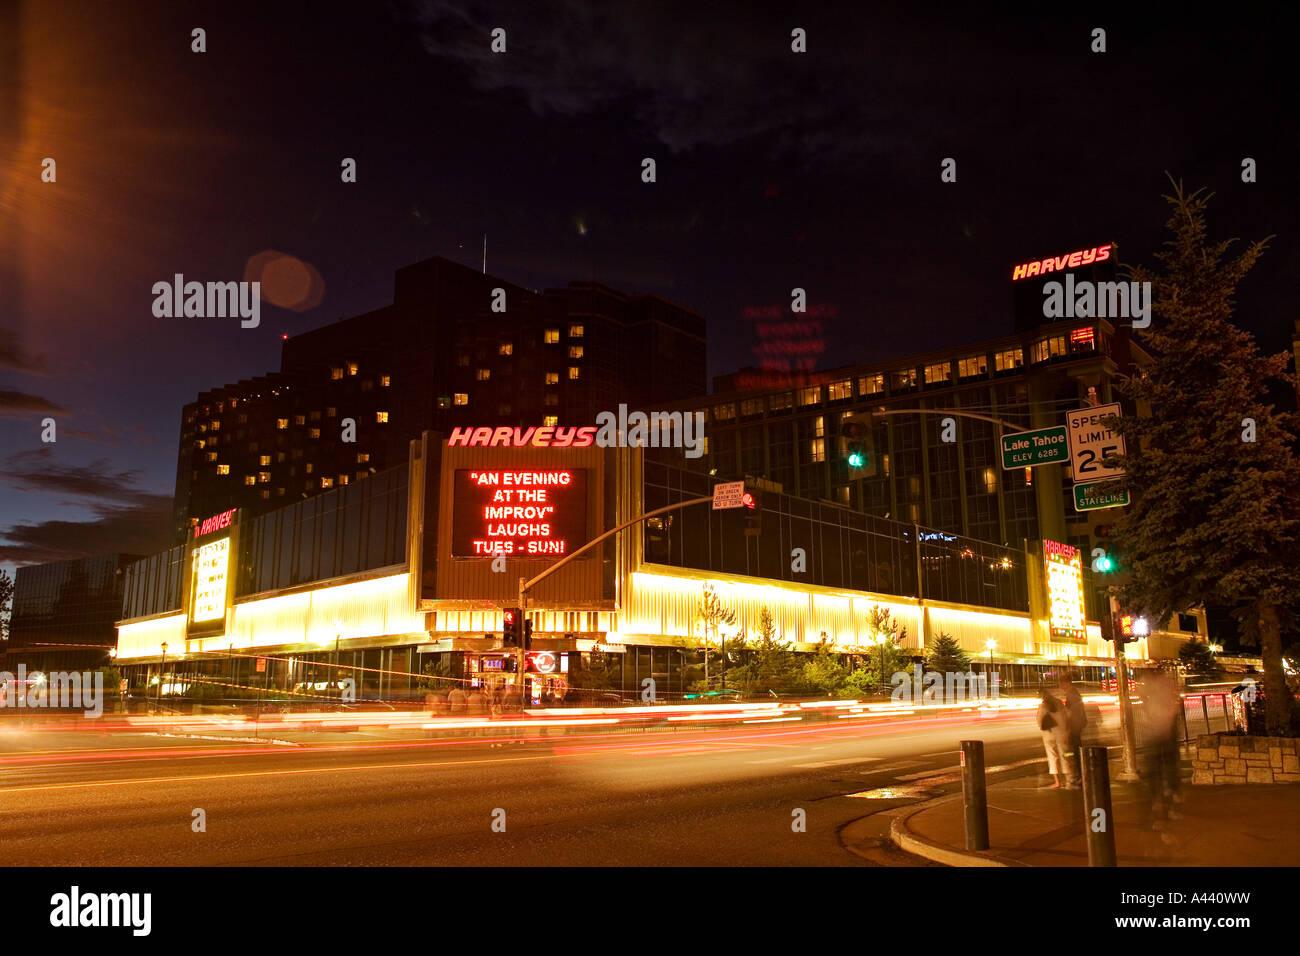 California Lake Tahoe Harveys Casino At Night Blurred Lights